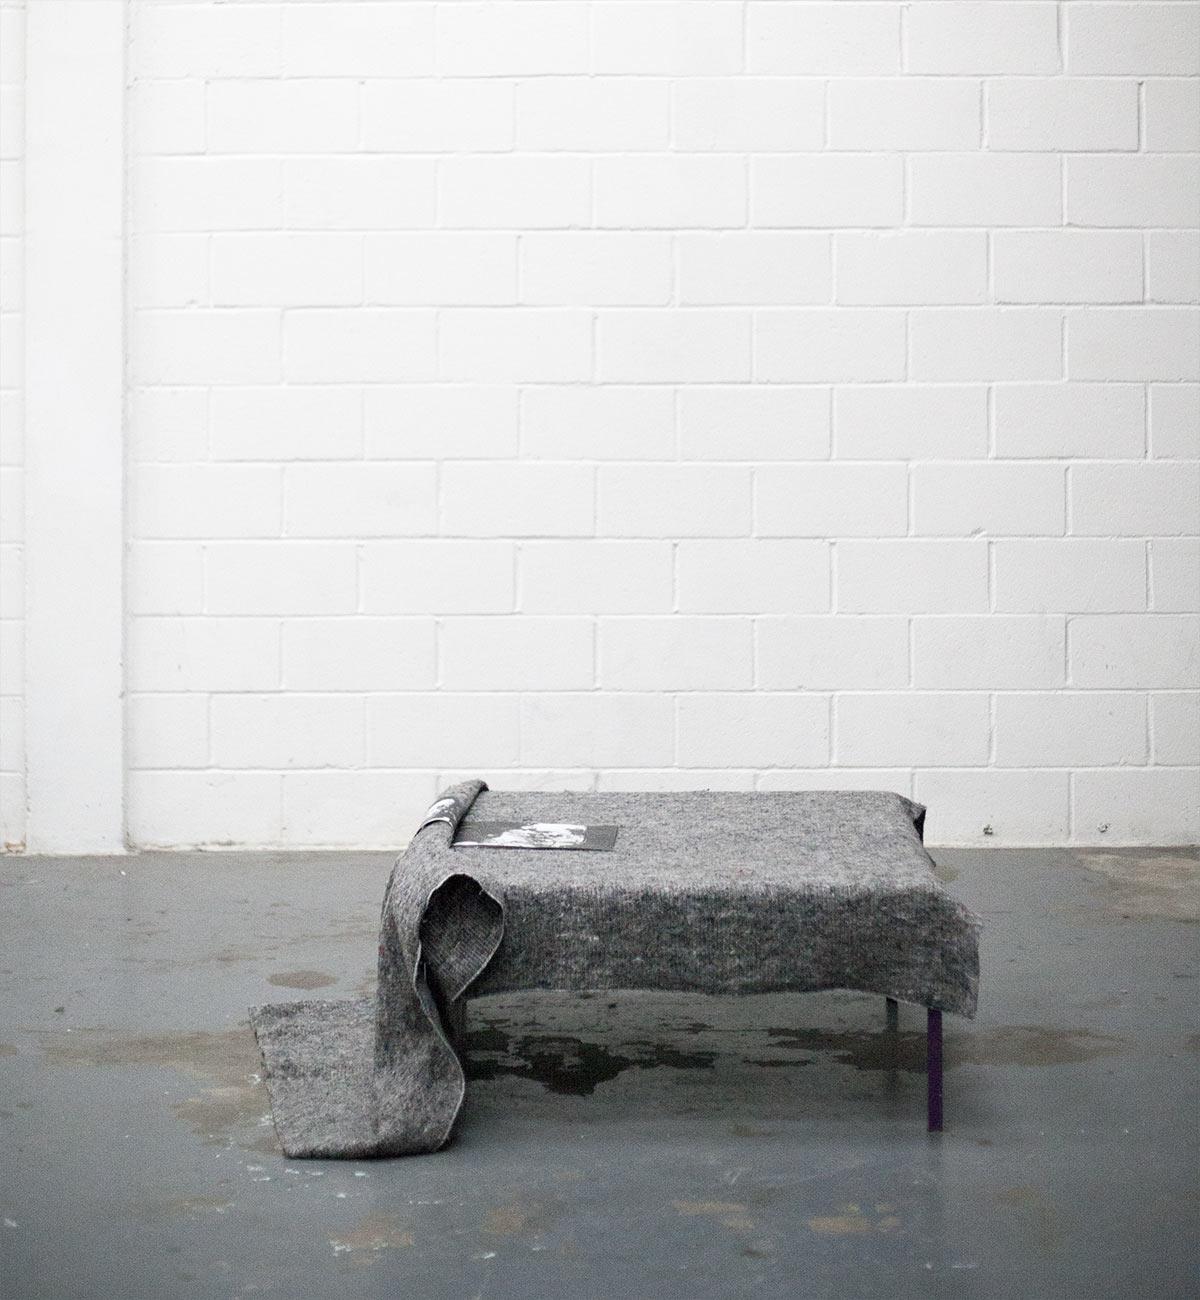 paula roush, Flora McCallica, installation view, Unit 8 msdm studio London